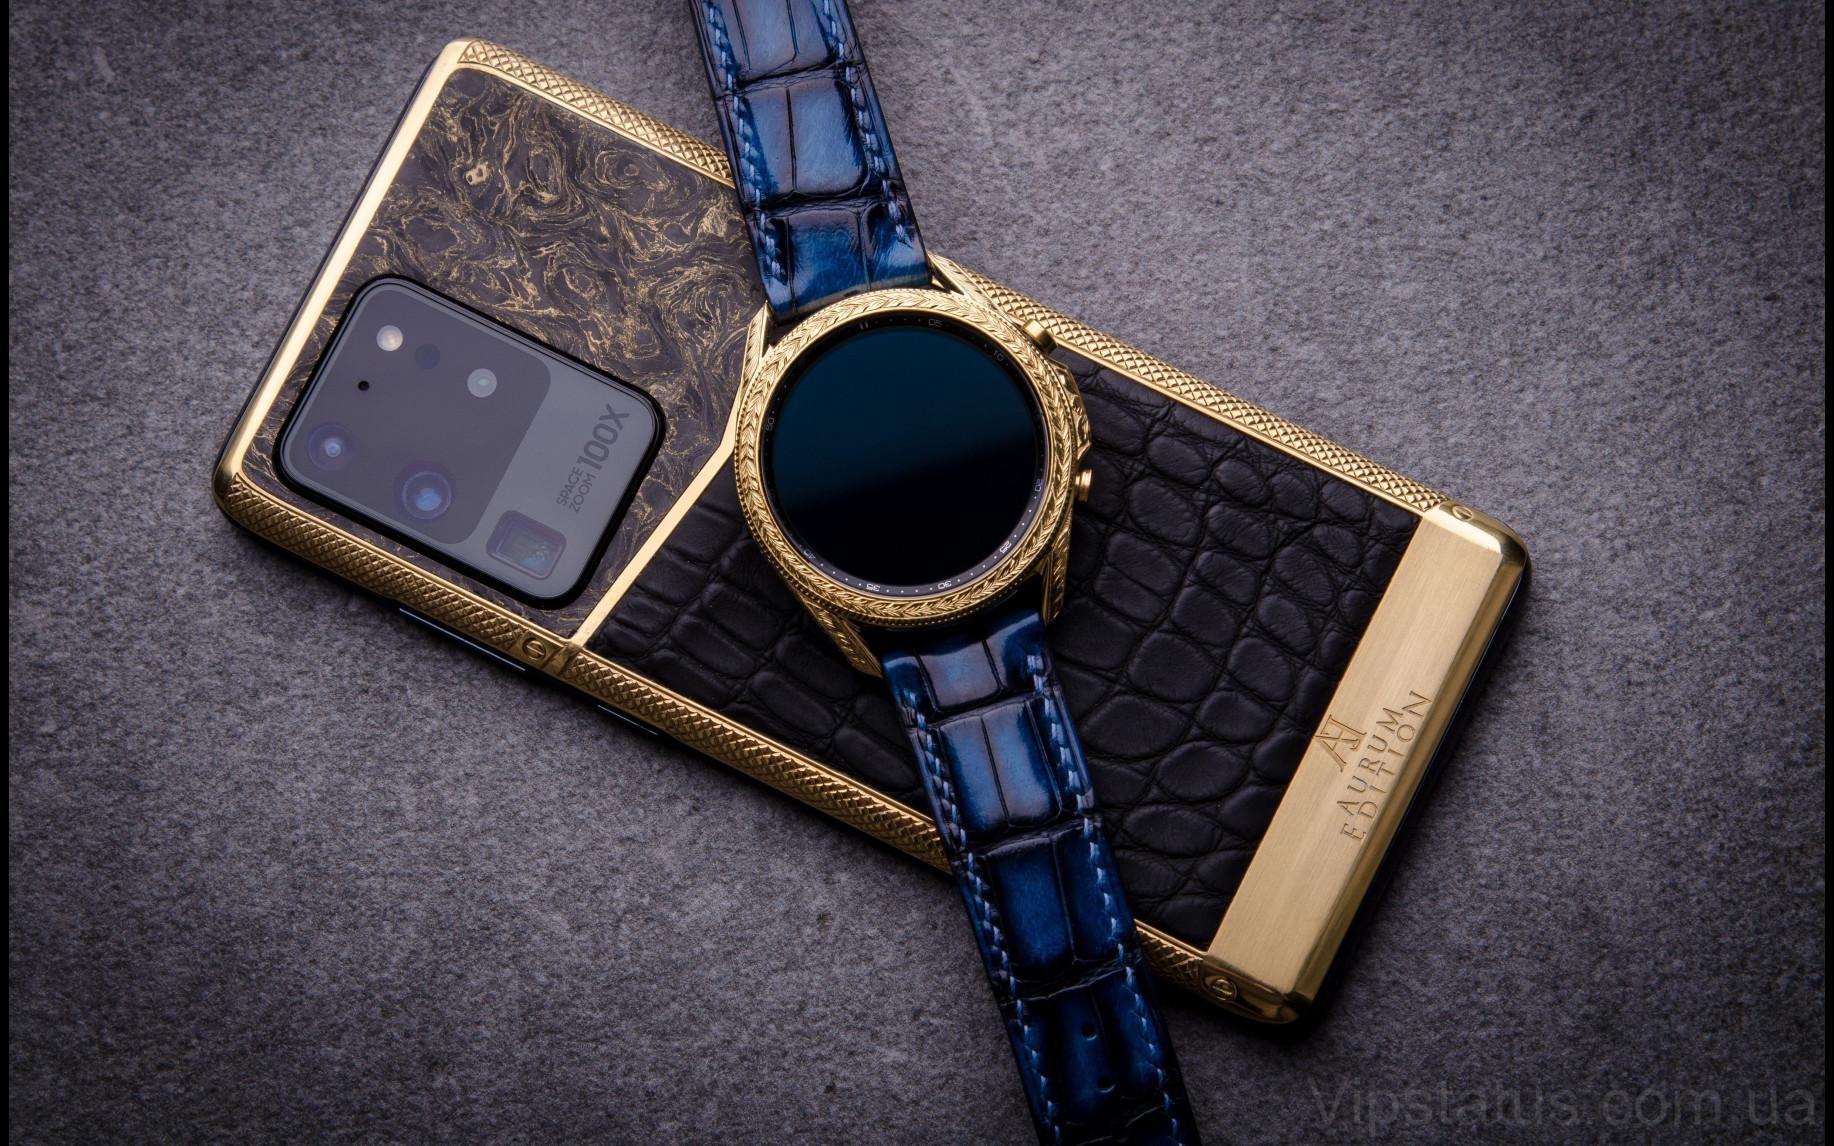 Elite Samsung S20 Gold Star Samsung S20 Gold Star image 7